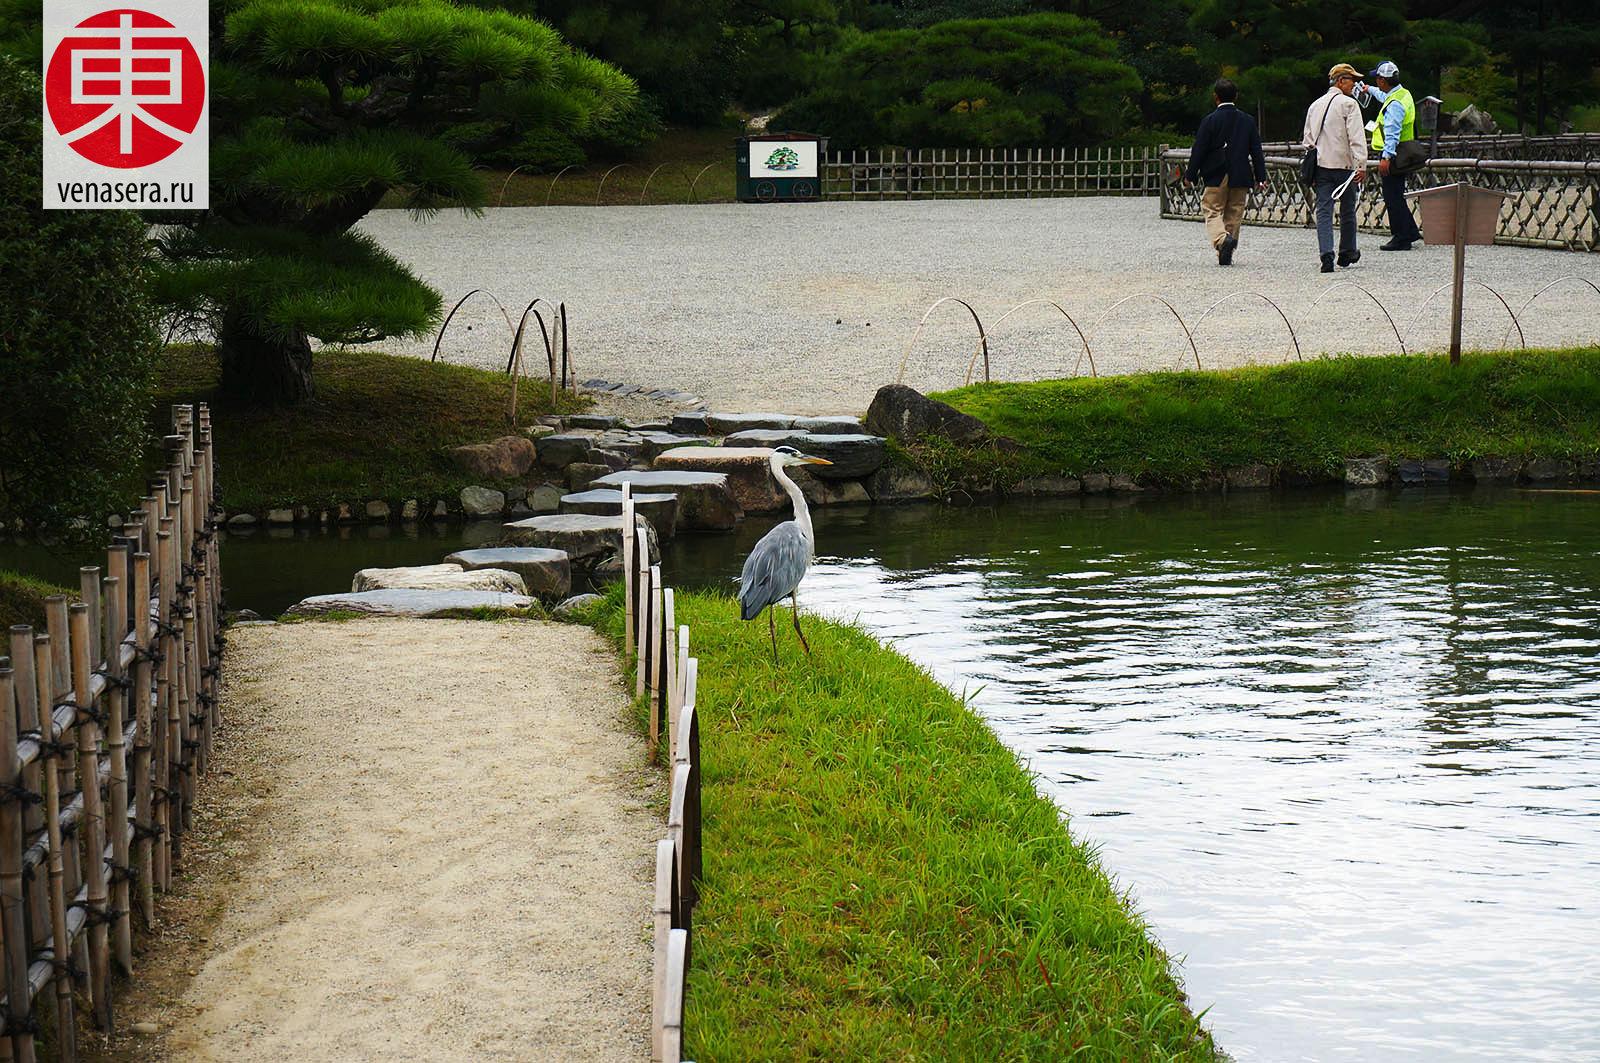 Рицурин Коэн, Ritsurin Koen, 栗林公園, Такамацу, Takamatsu, 高松, Сикоку, Shikoku, 四国, Япония, Japan, 日本.